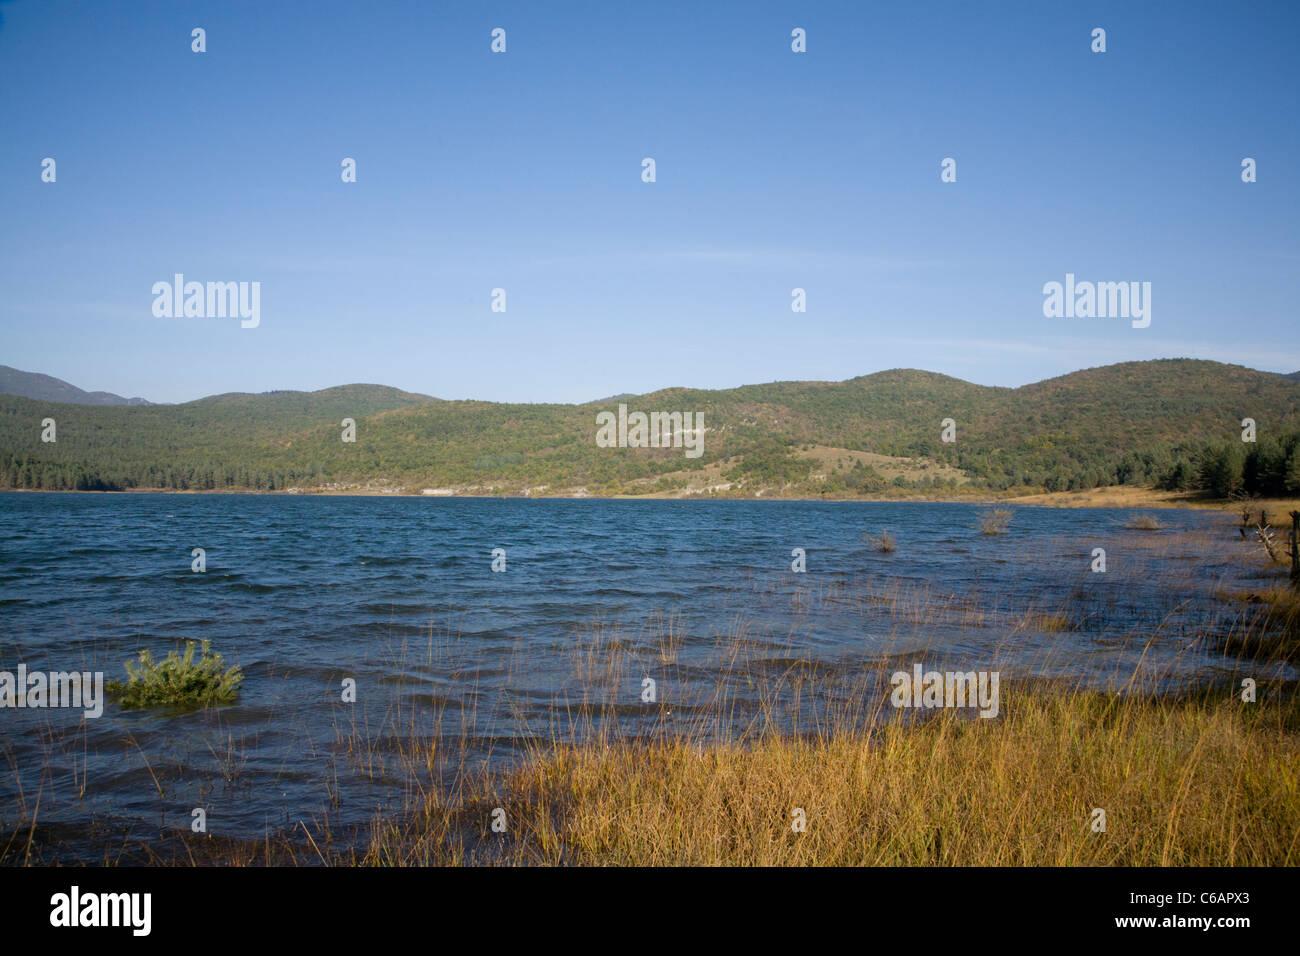 Palsko Lake, Pivka lakes, Slovenia. - Stock Image